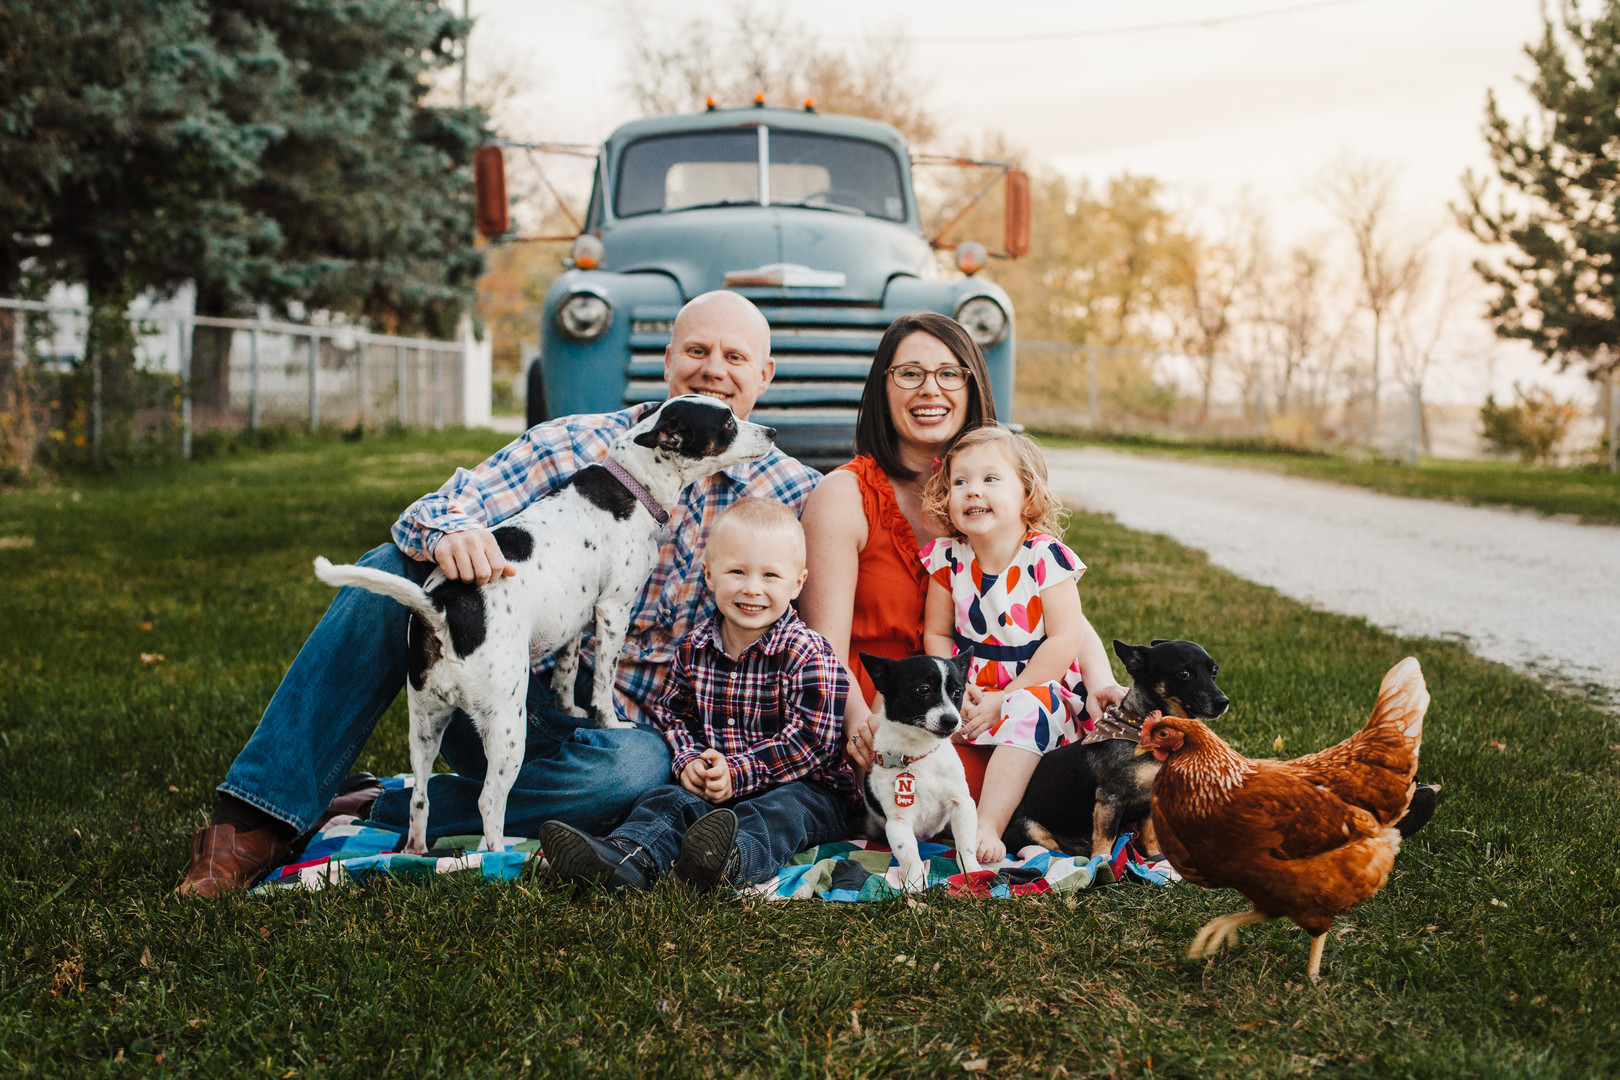 TRUE IMAGERY HARLAN FAMILY PHOTOGRAPHER